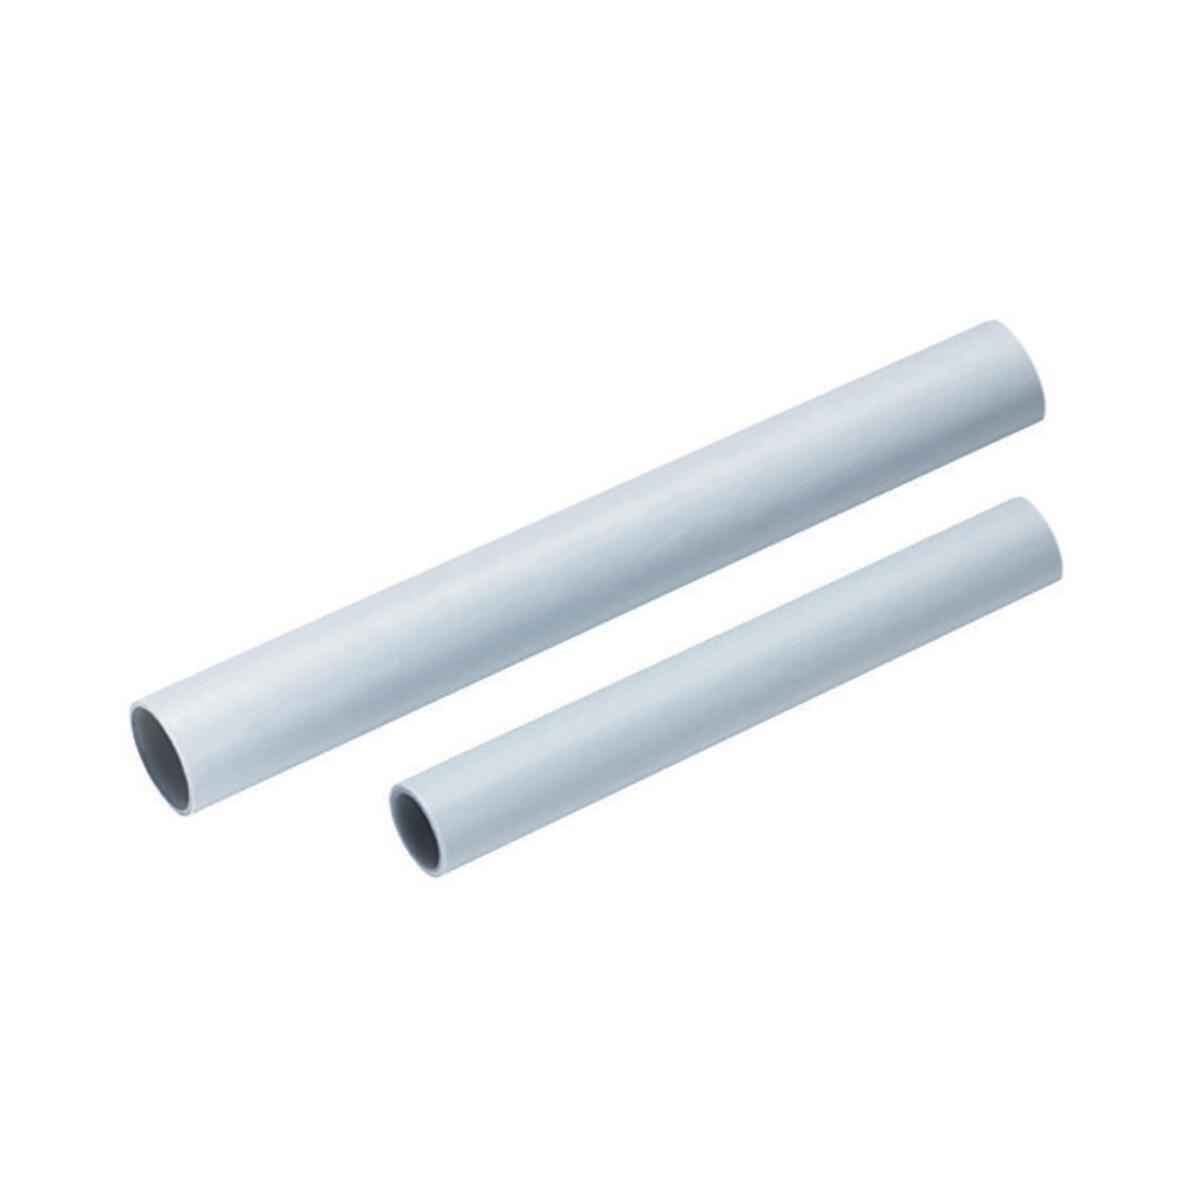 Tubo in barre multistrato nudo EMMETI Ø 16 mm x L 2 m - 3